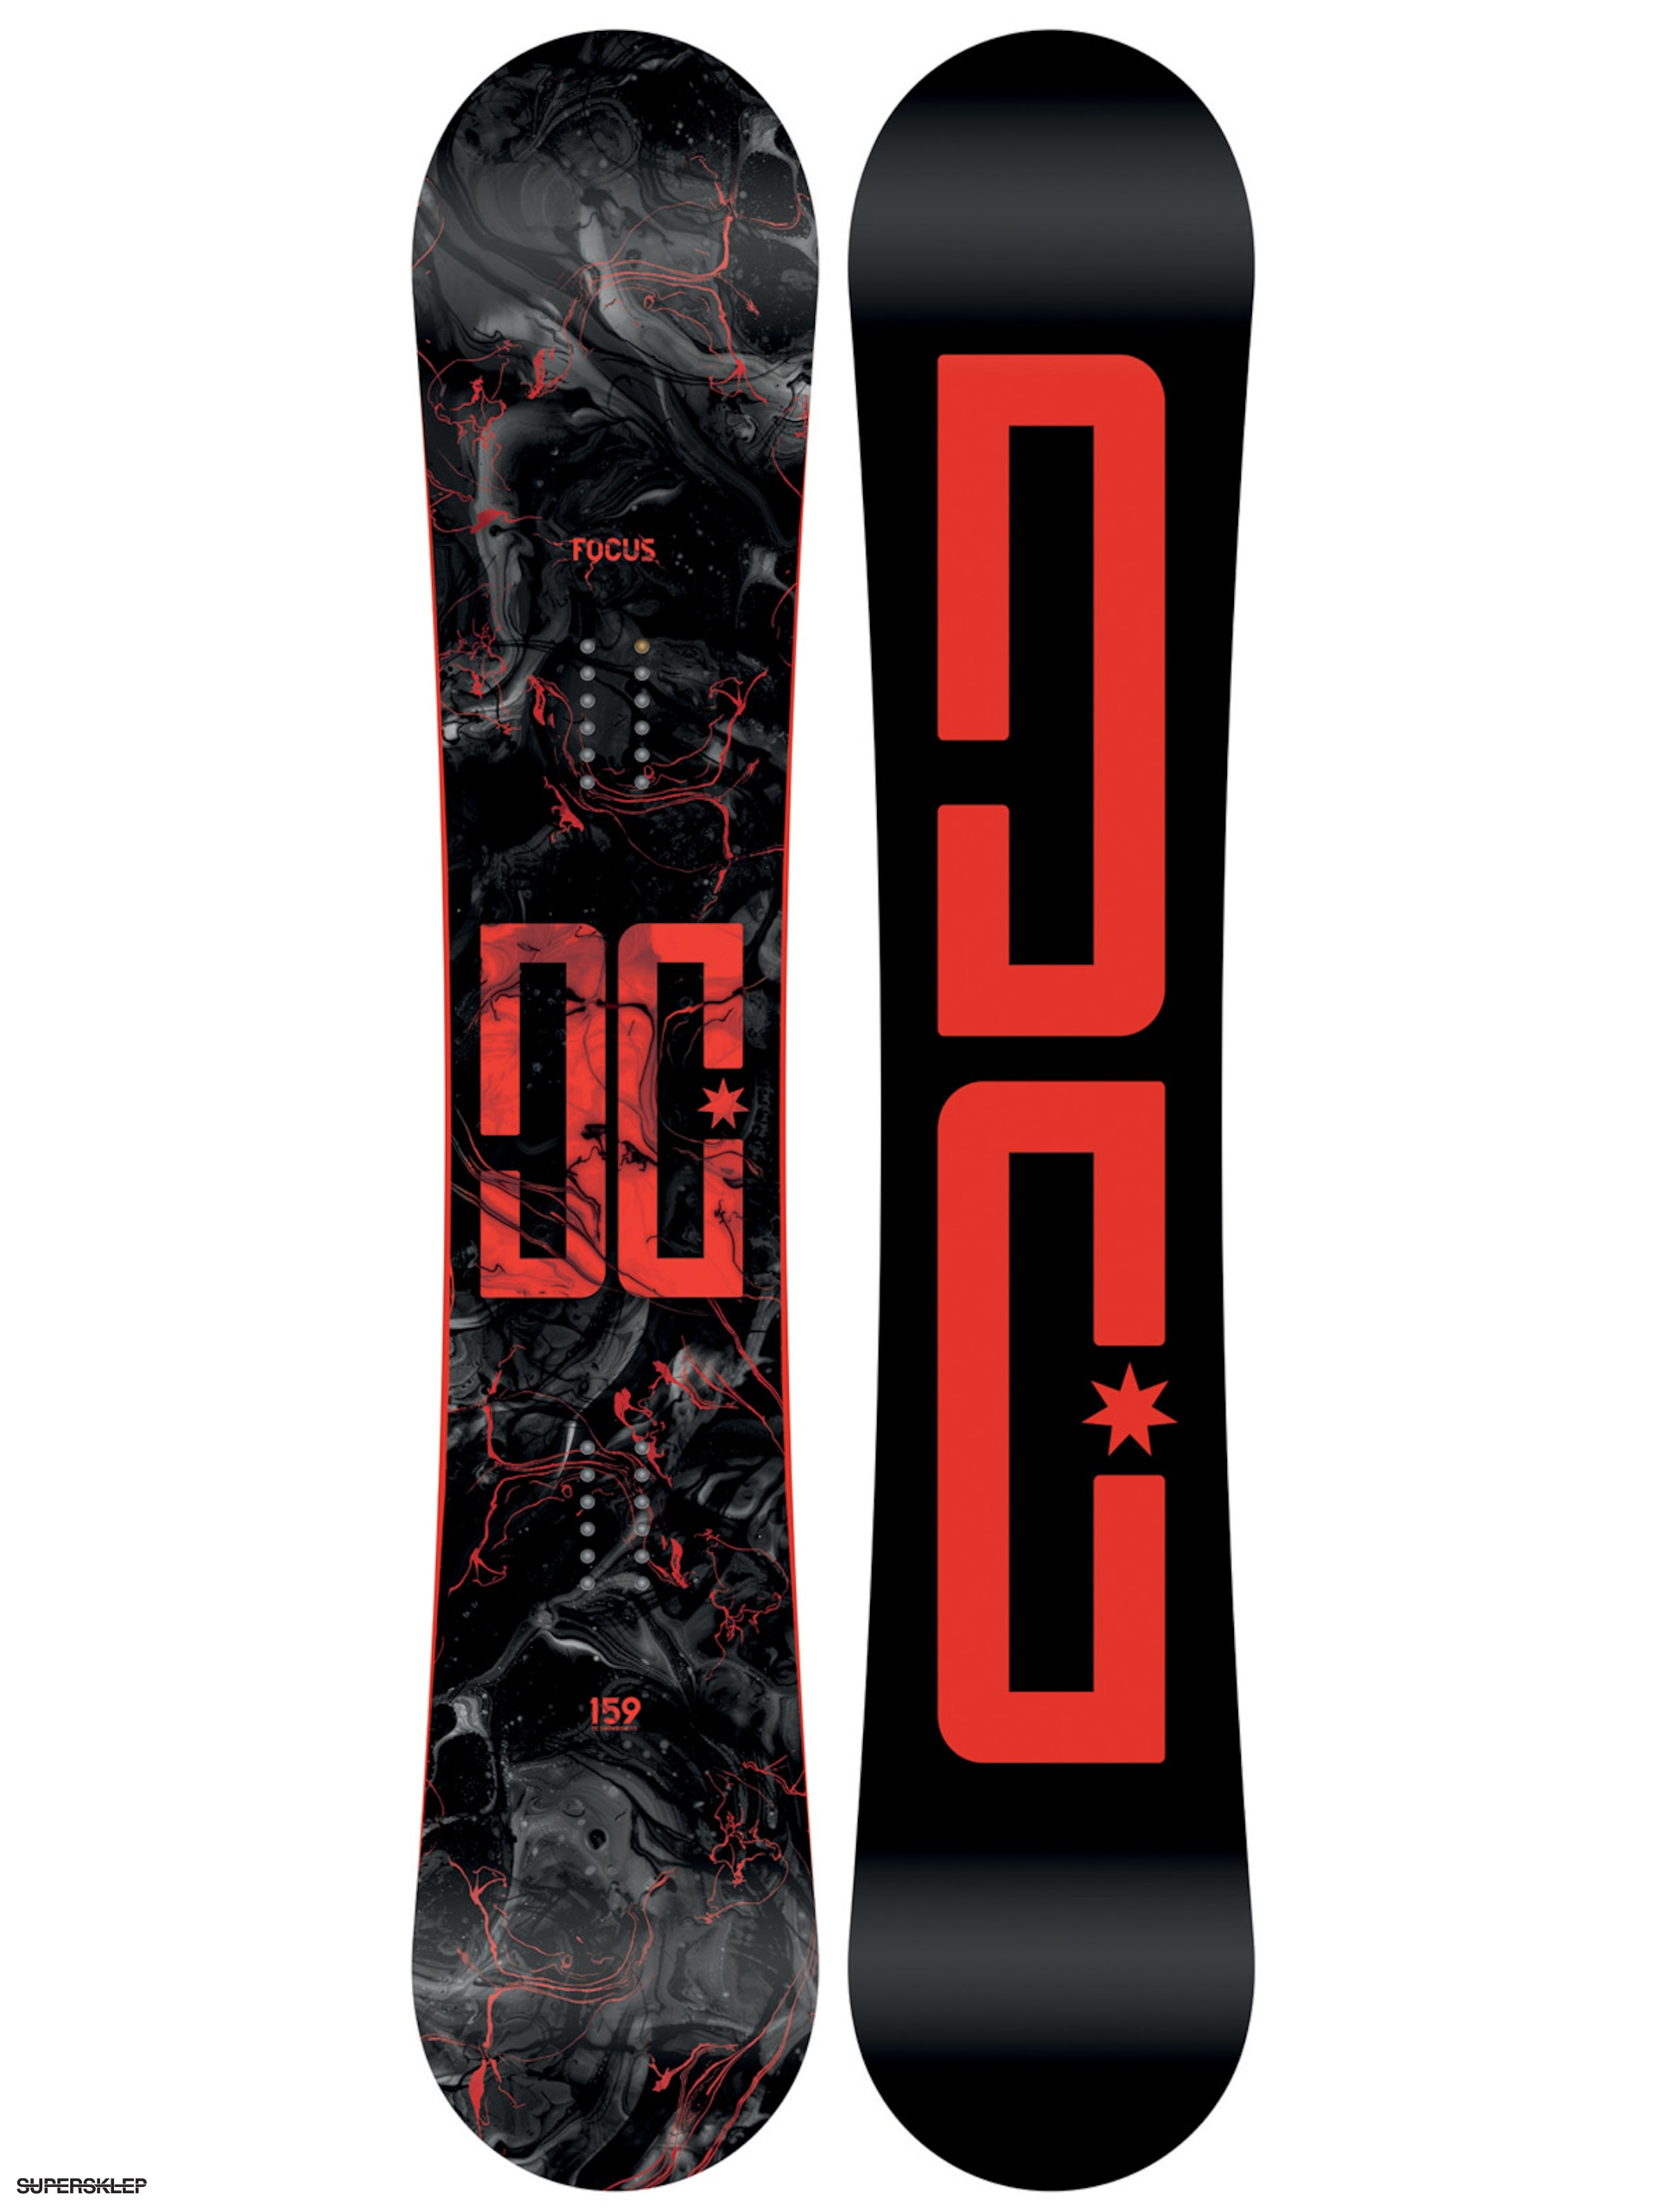 Deska snowboardowa DC Focus (black red) 53a2ce3620